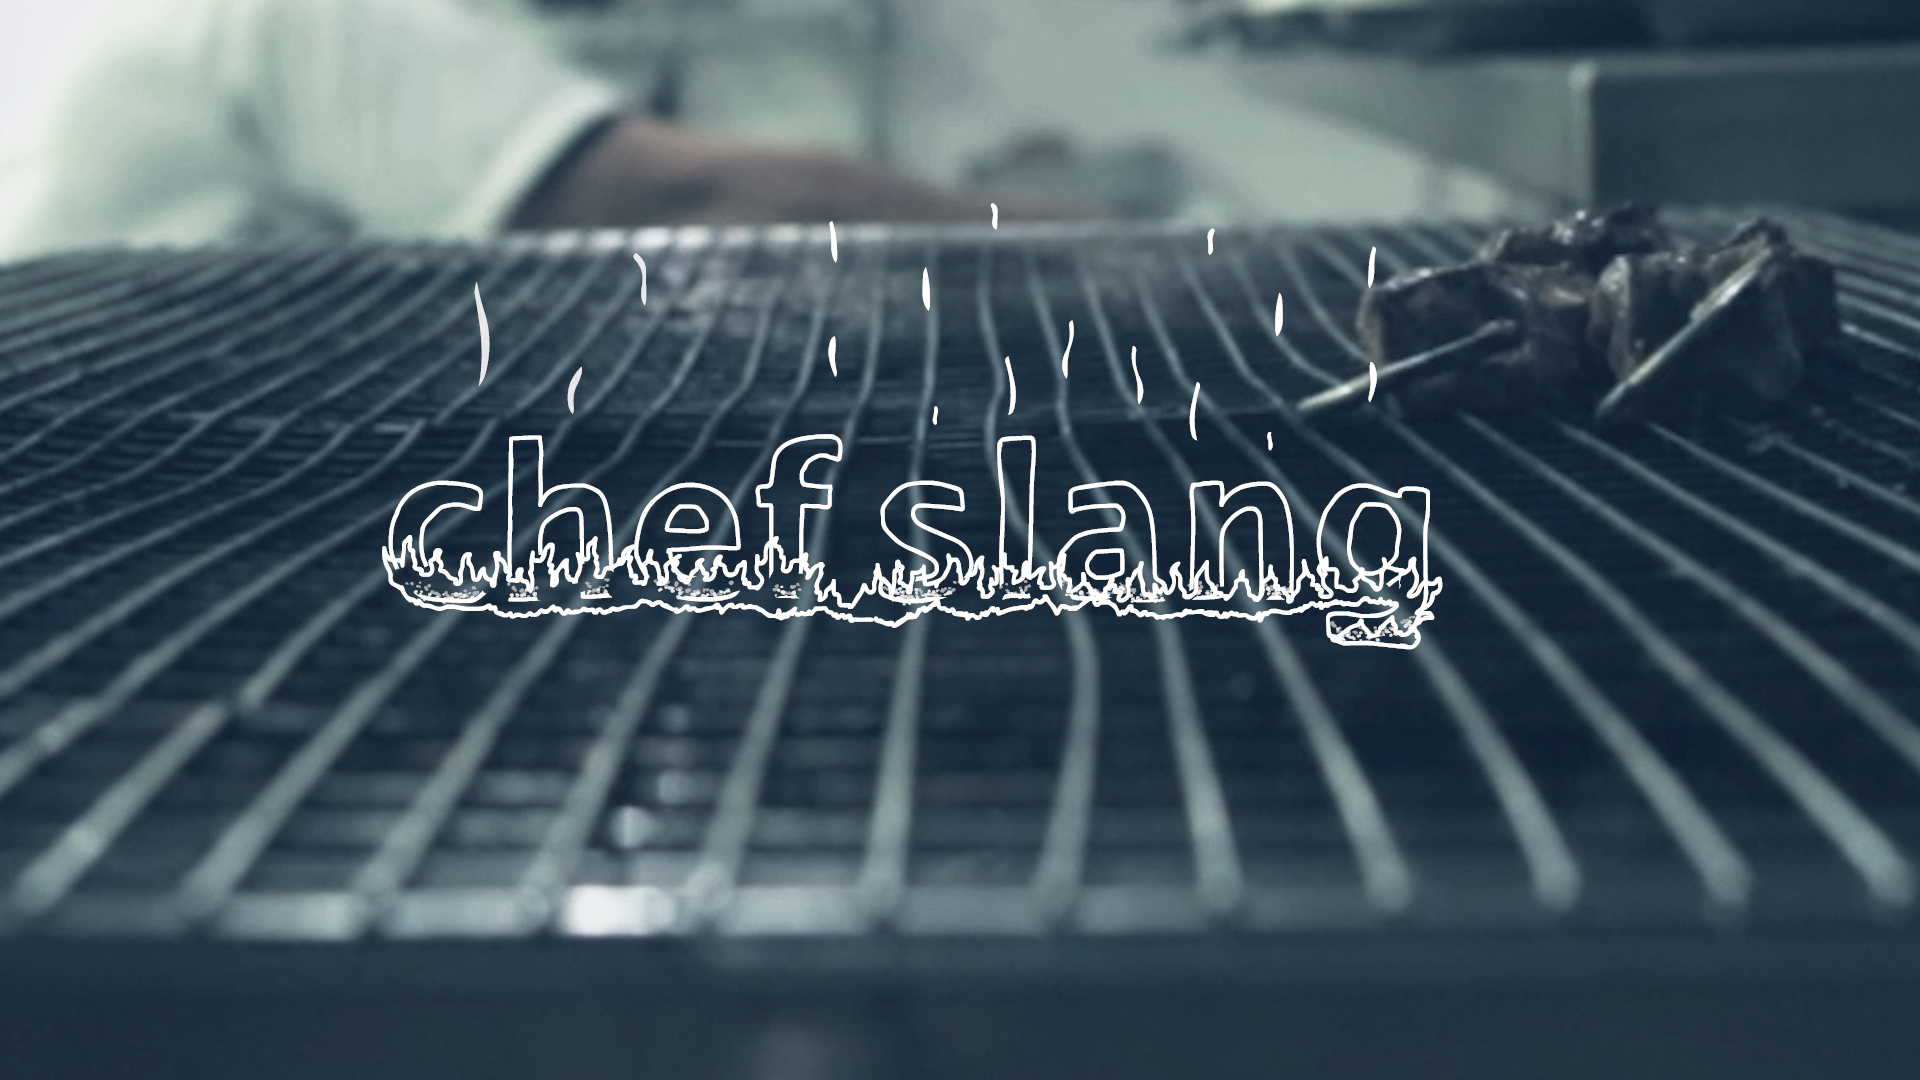 Chef Slang: Shoemaker